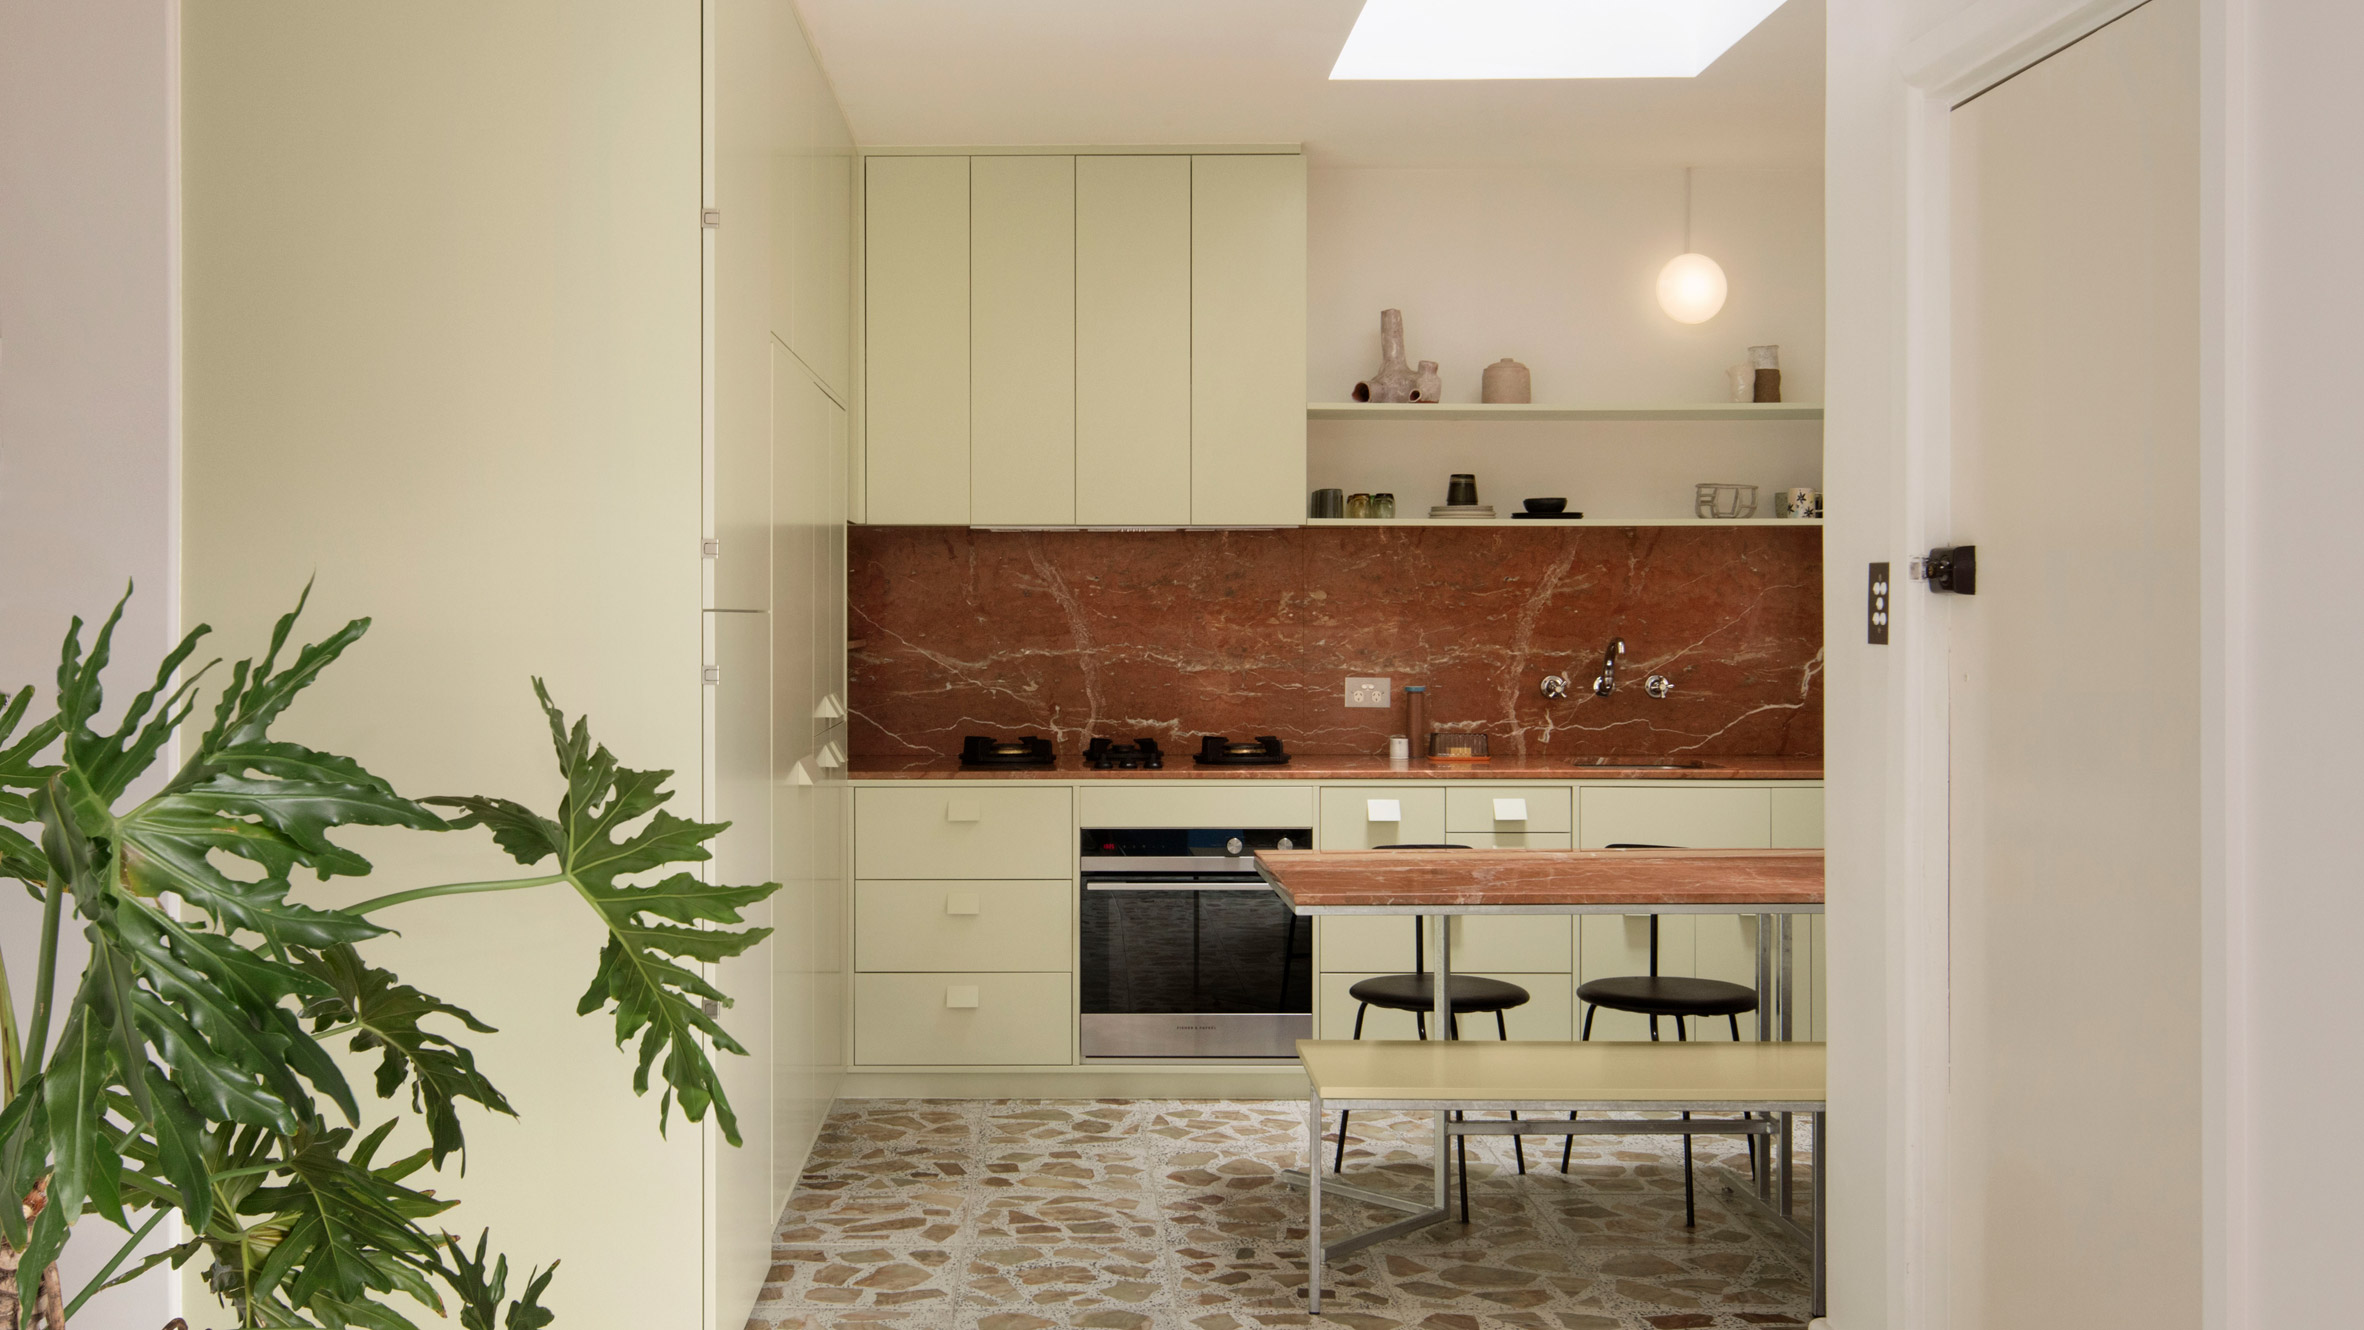 Pistachio green kitchen